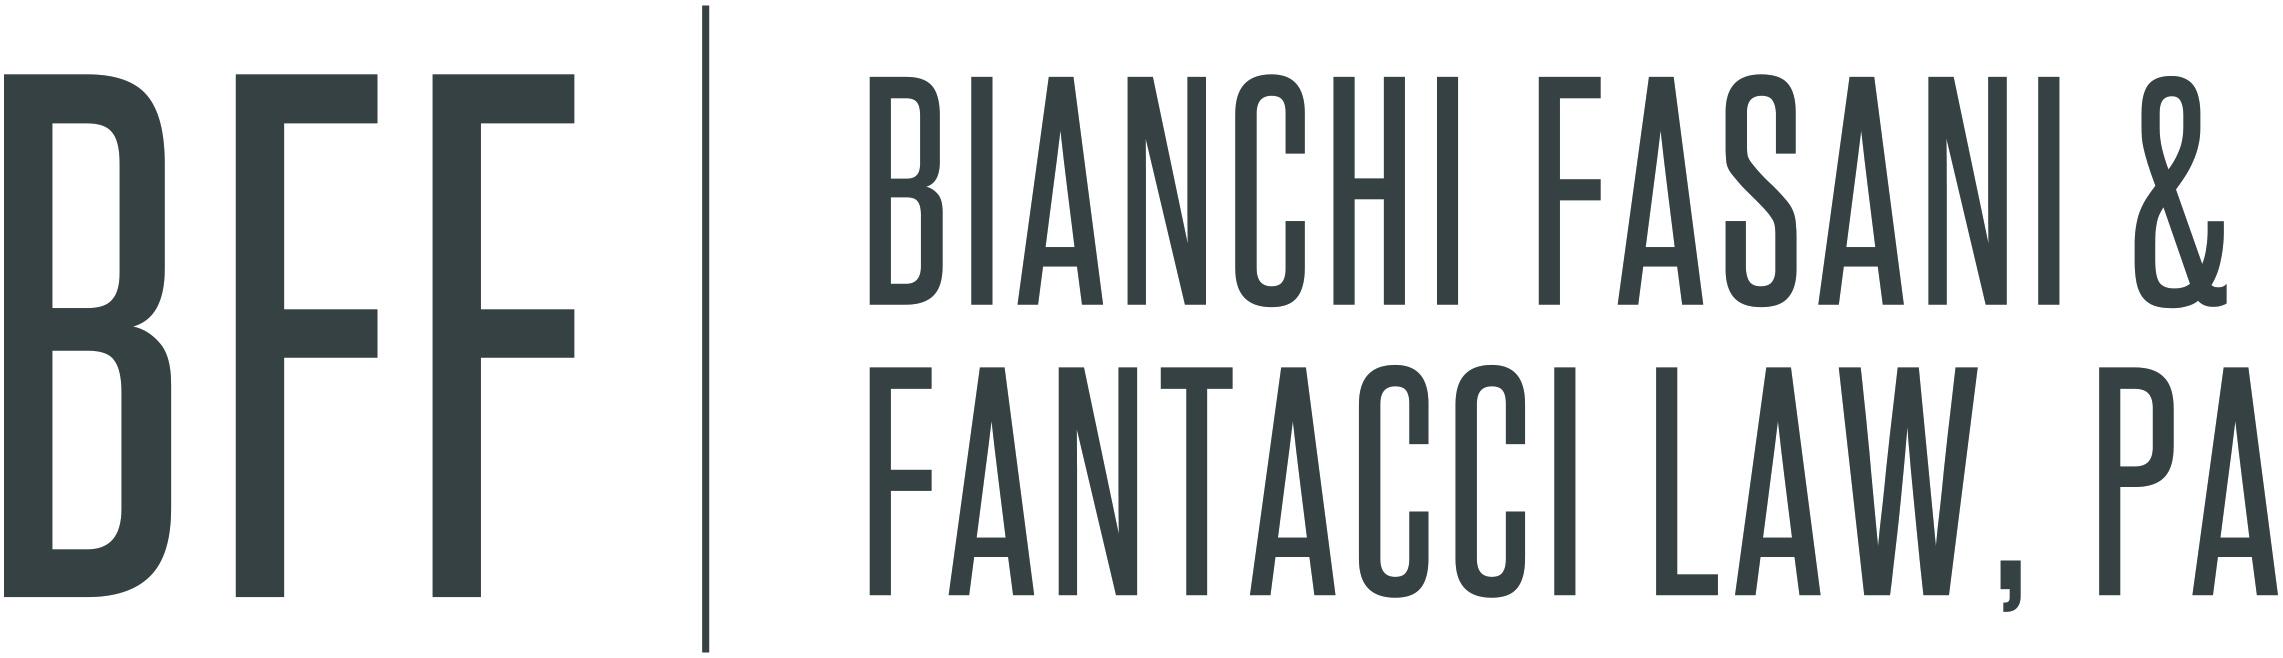 Bianchi Fasani & Fantacci Law, P.A